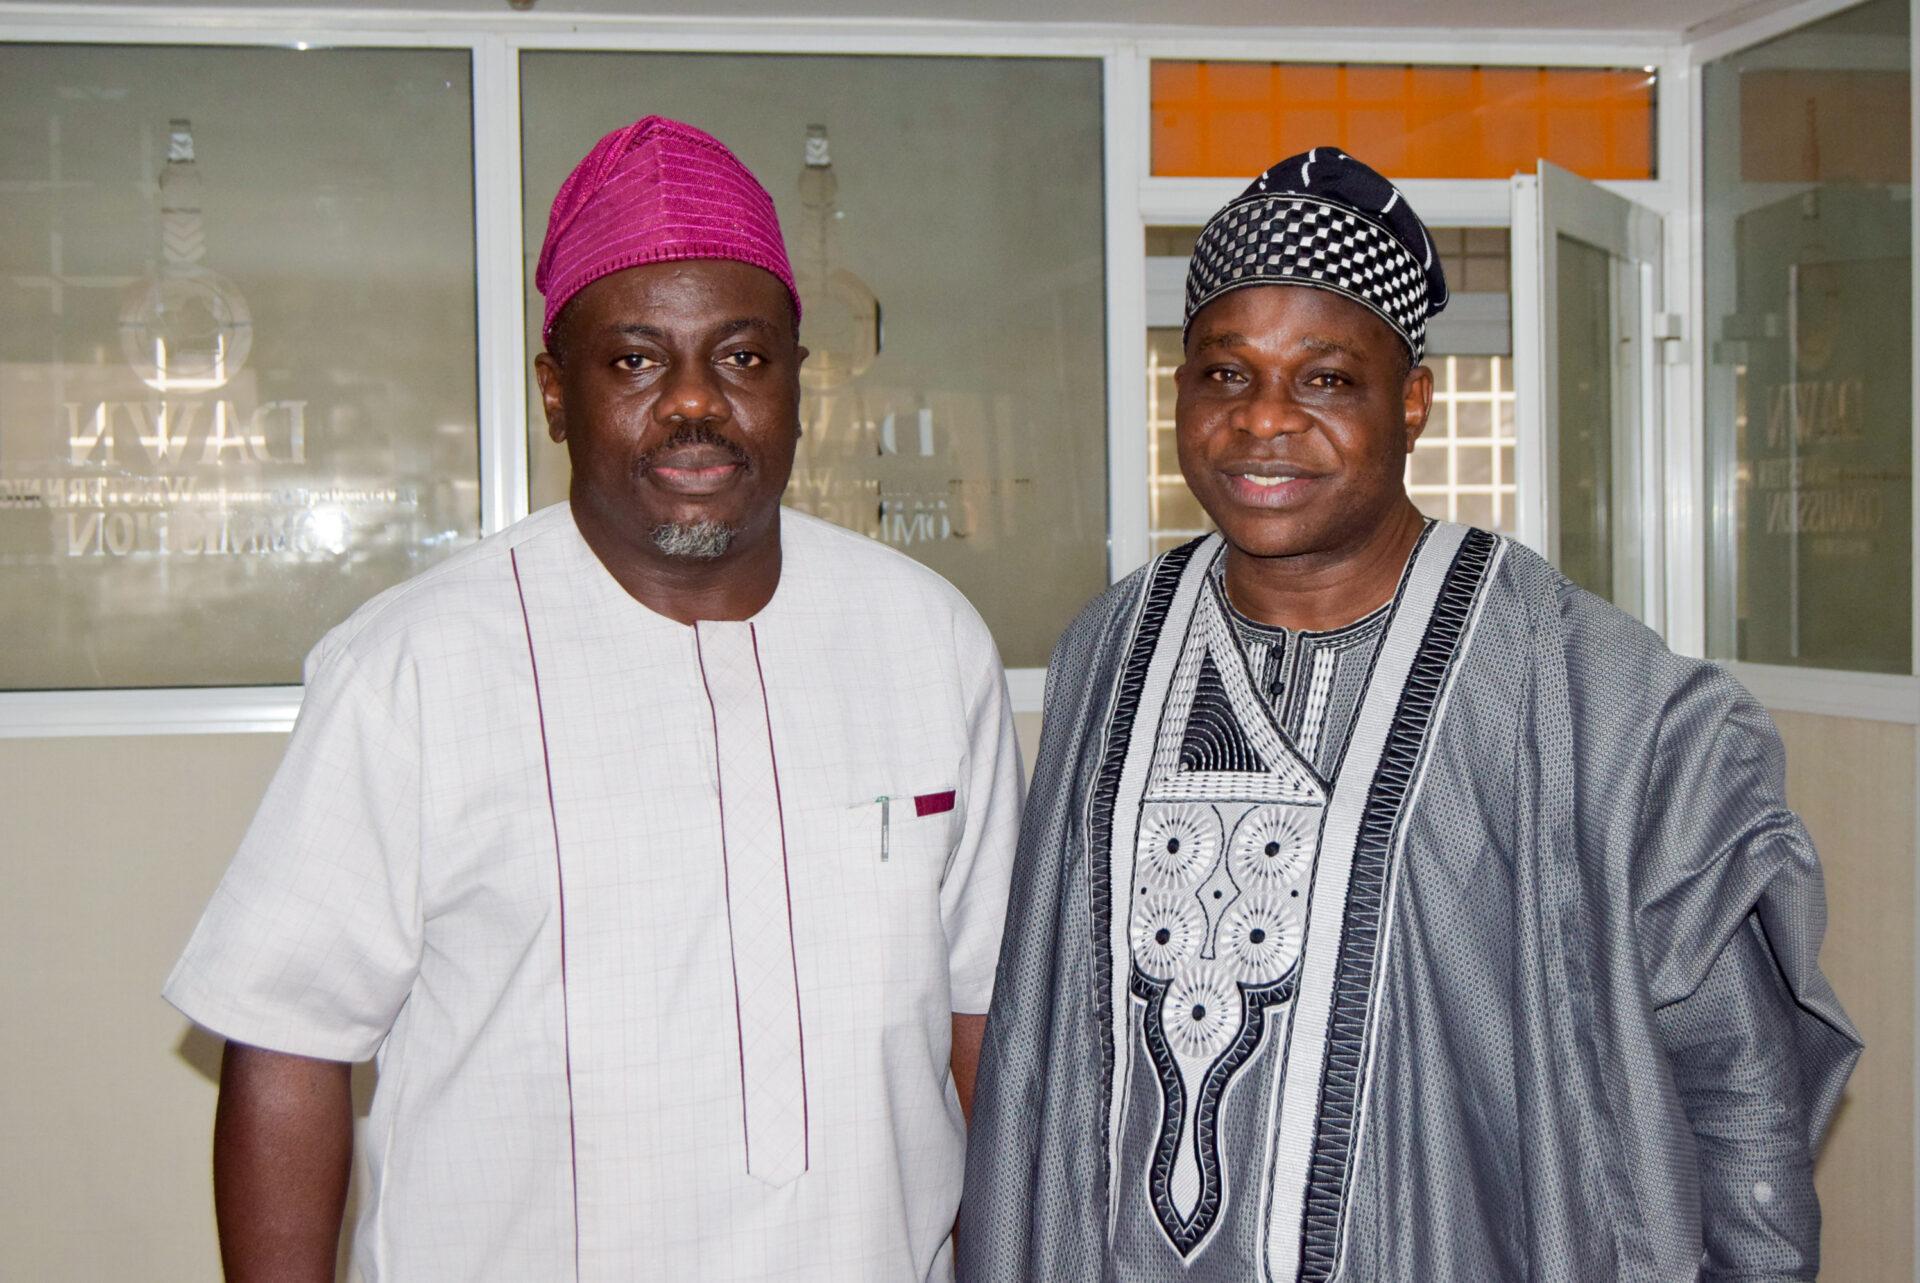 Ambassador Kayode Oguntuase Pays Working Visit to DAWN Commission